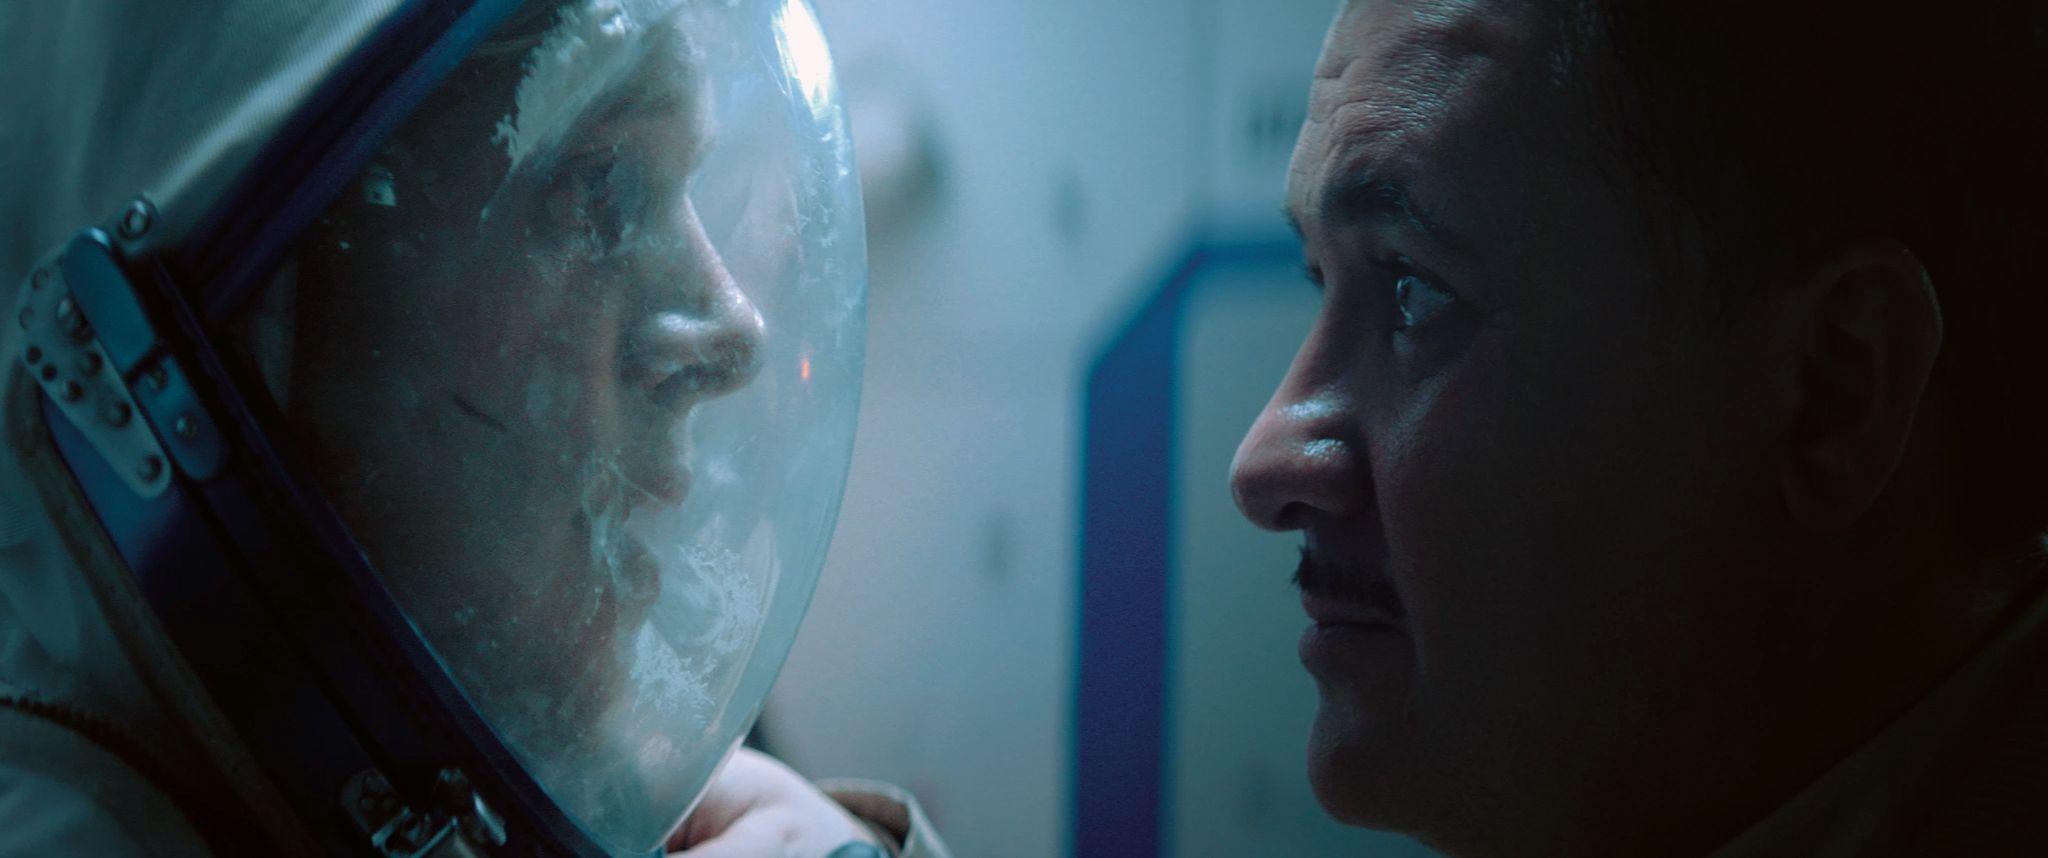 El corto 'Flotando' de Frankie De Leonardis gana el SundanceTV Shorts